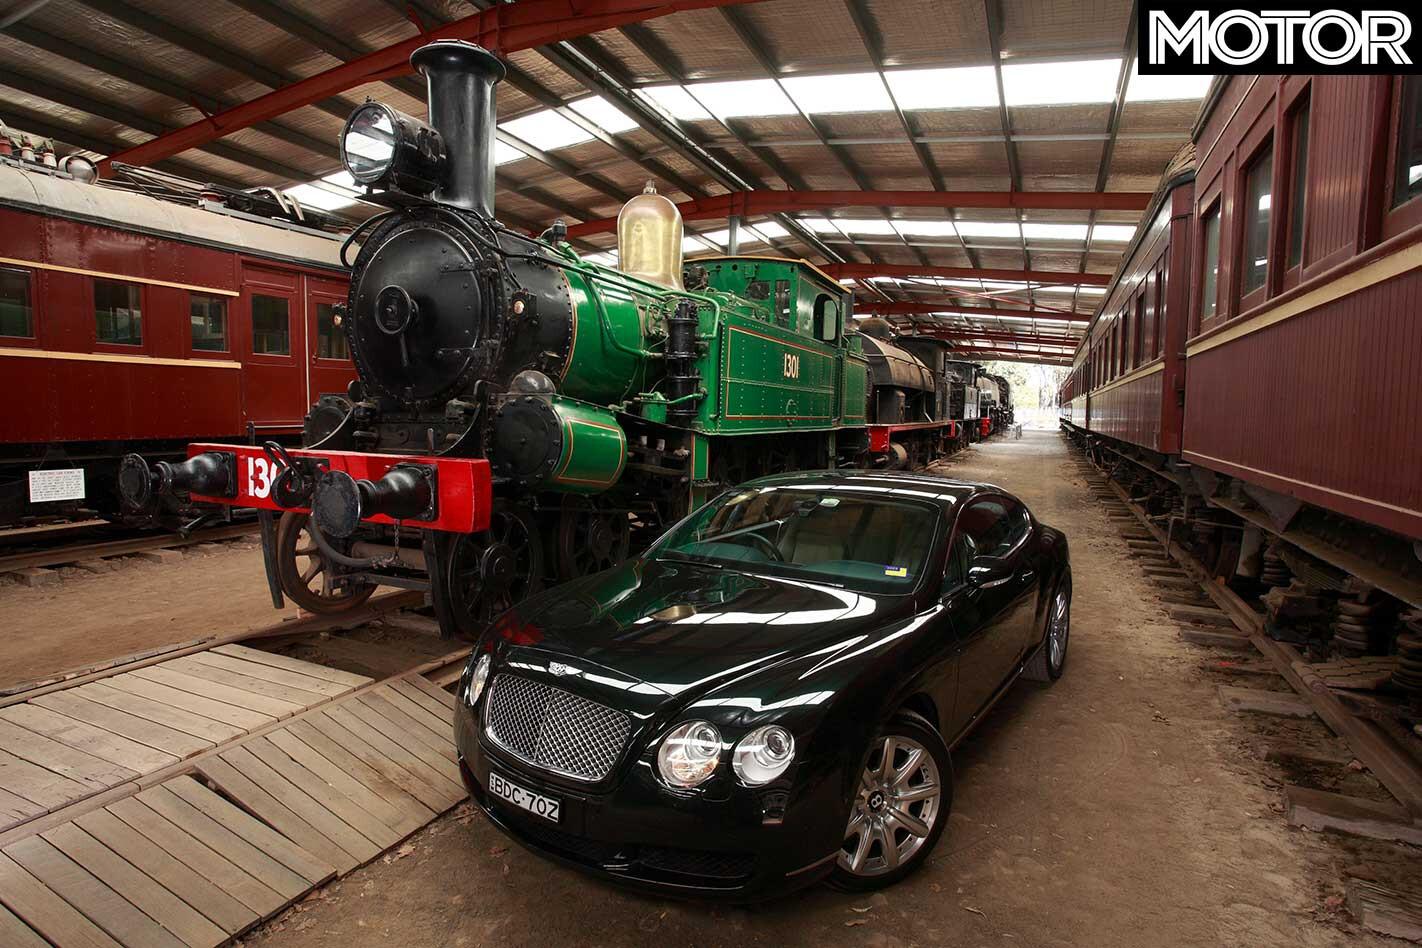 2008 Bentley Continental GT Thirlmere Rail Heritage Centre Jpg